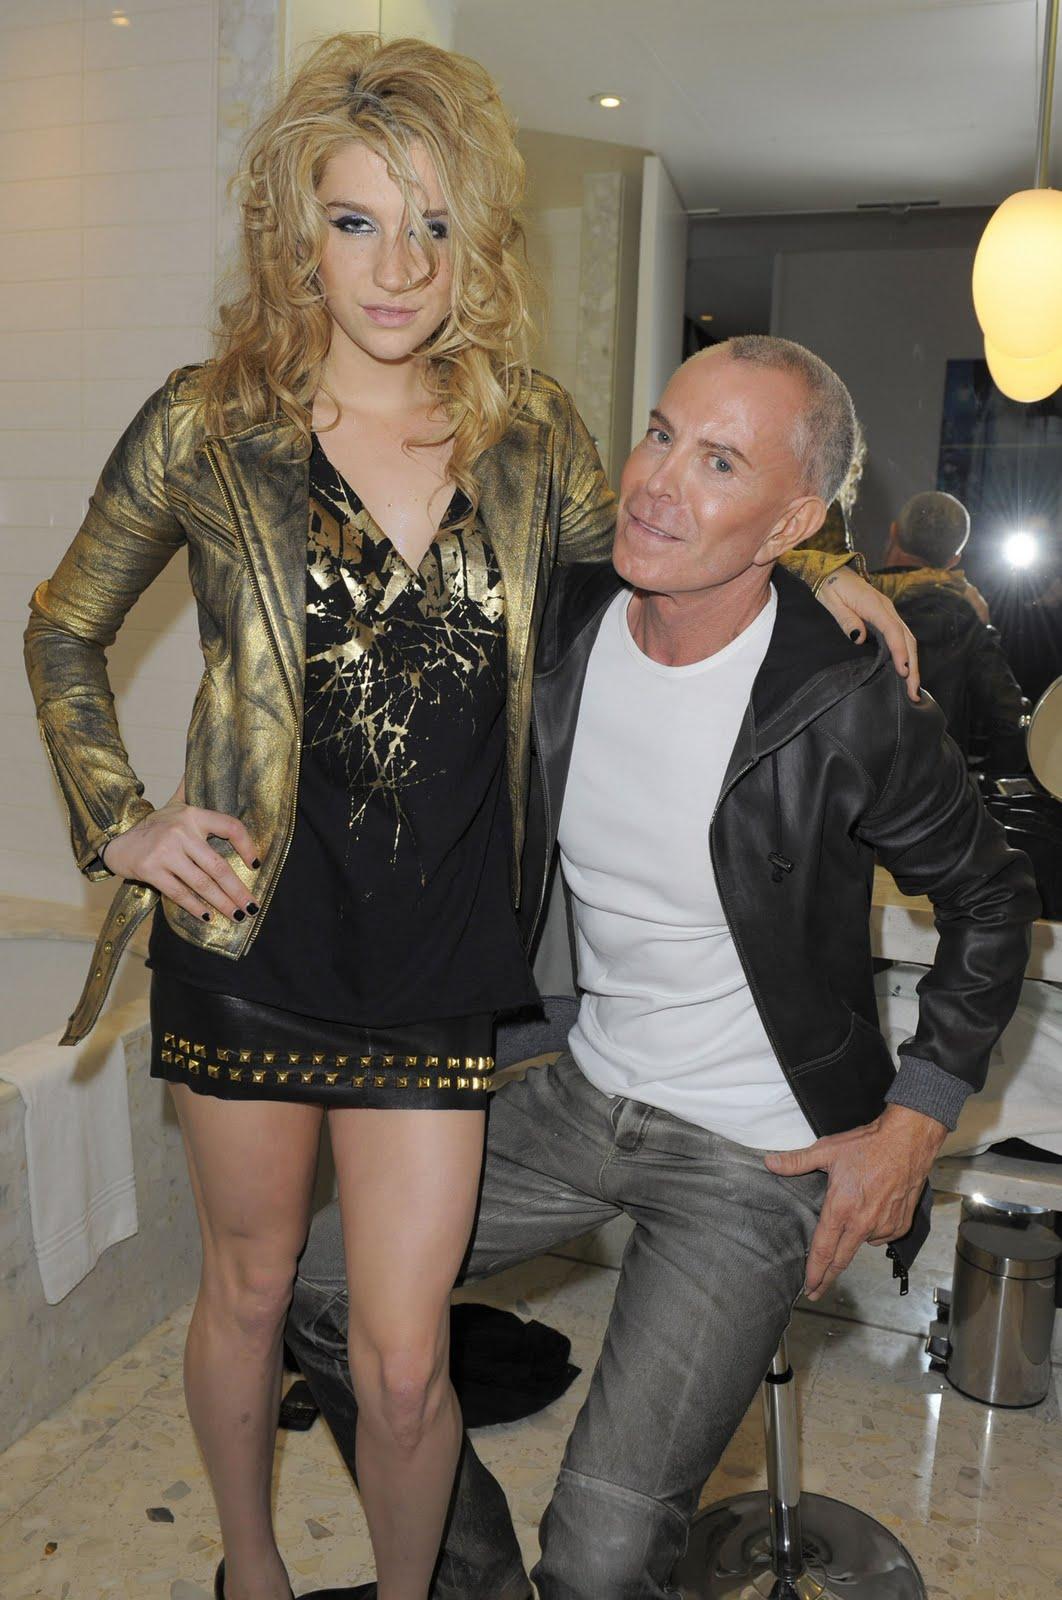 http://3.bp.blogspot.com/_IUzrVt5aNHI/TU0RWhMJZjI/AAAAAAAAEnk/uSK8xpTMOSY/s1600/Kesha_Sebert_Personal_Fitting_with_Jean-Claude_Jitrois_in_Paris_January_25_2010_07-745572.jpg